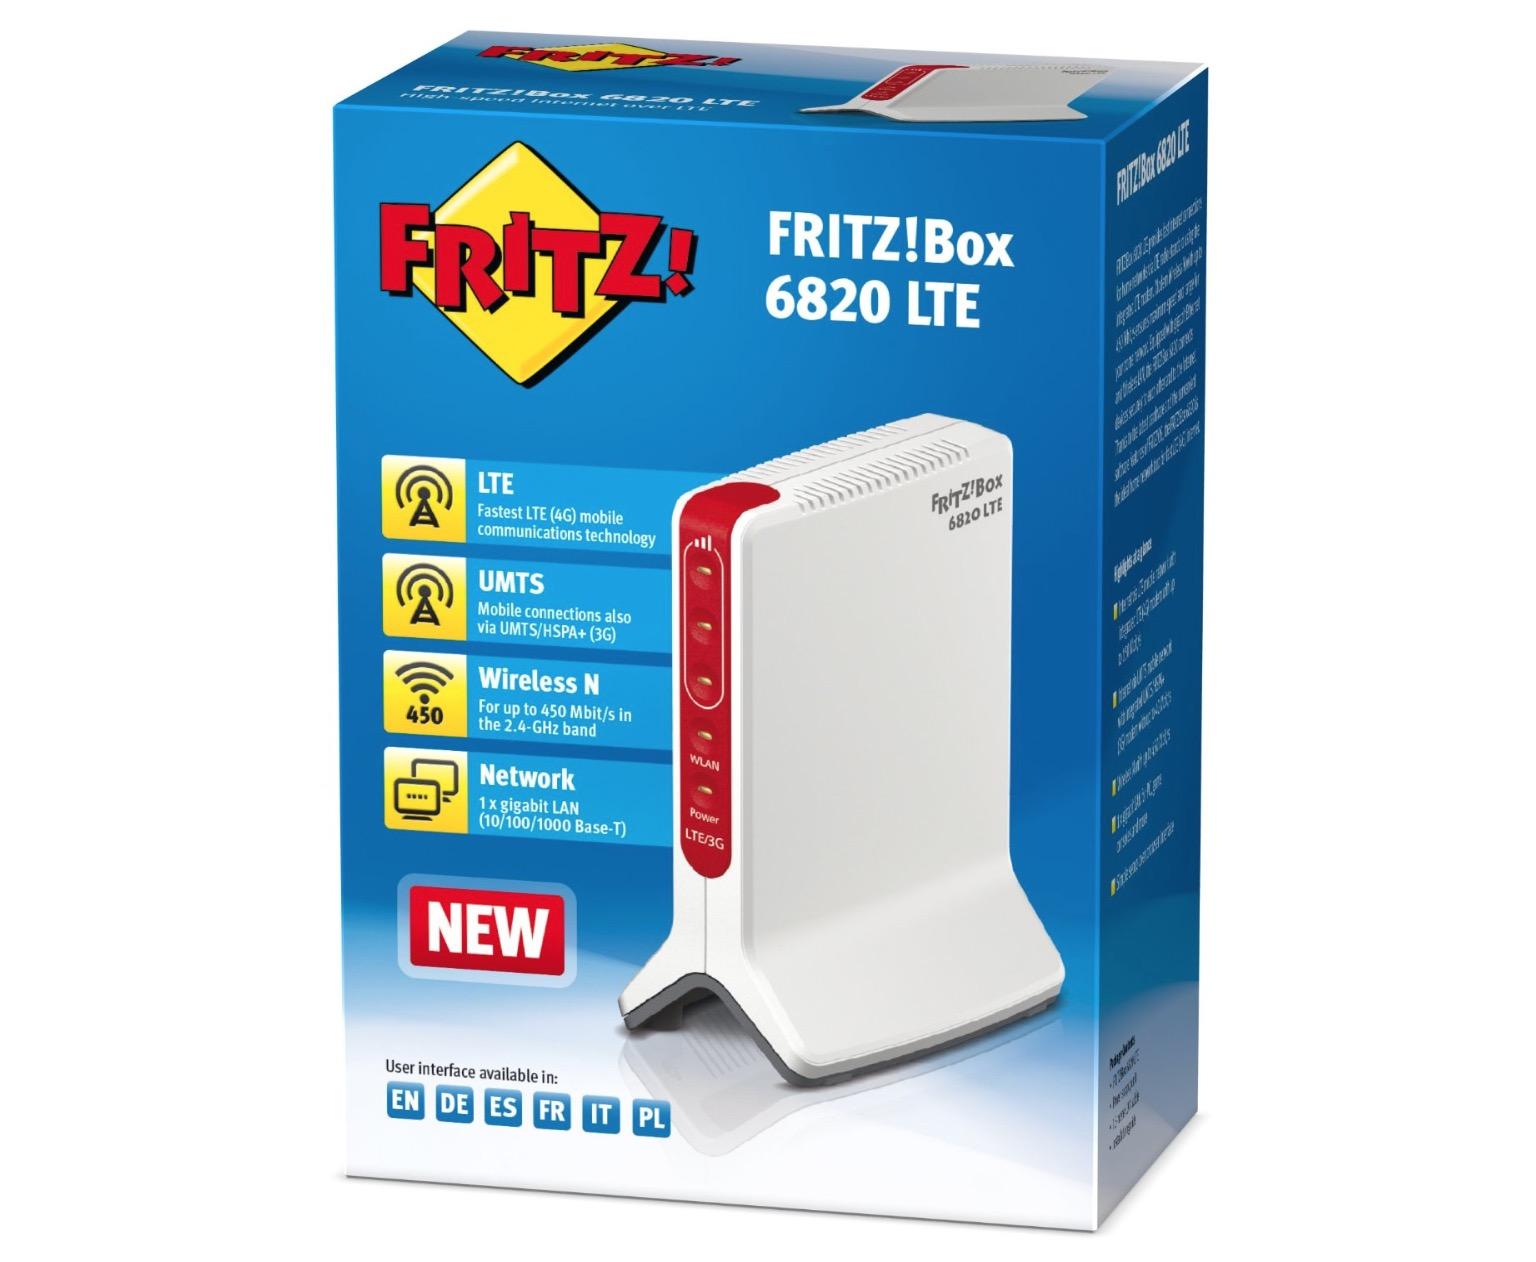 FRITZ!Box 6820 LTE 3